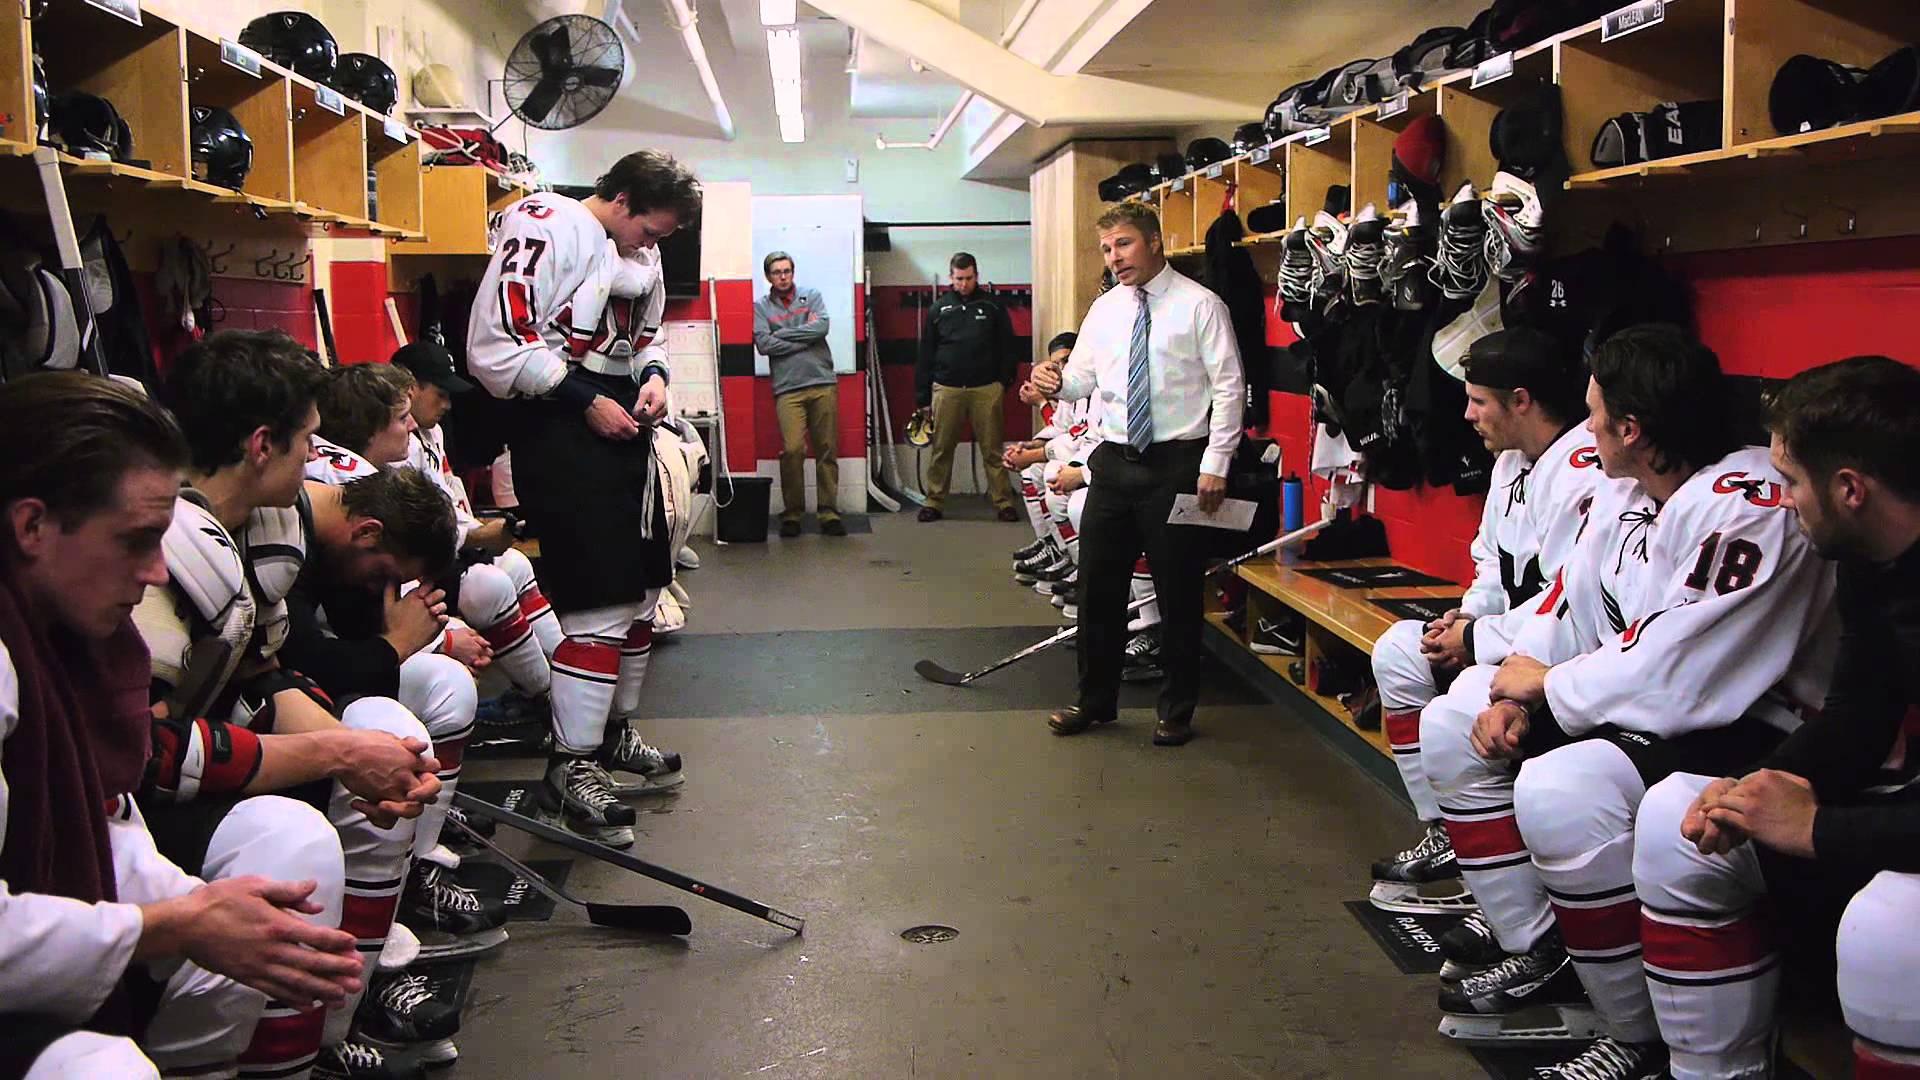 Carleton Ravens Men's Hockey 2013-14